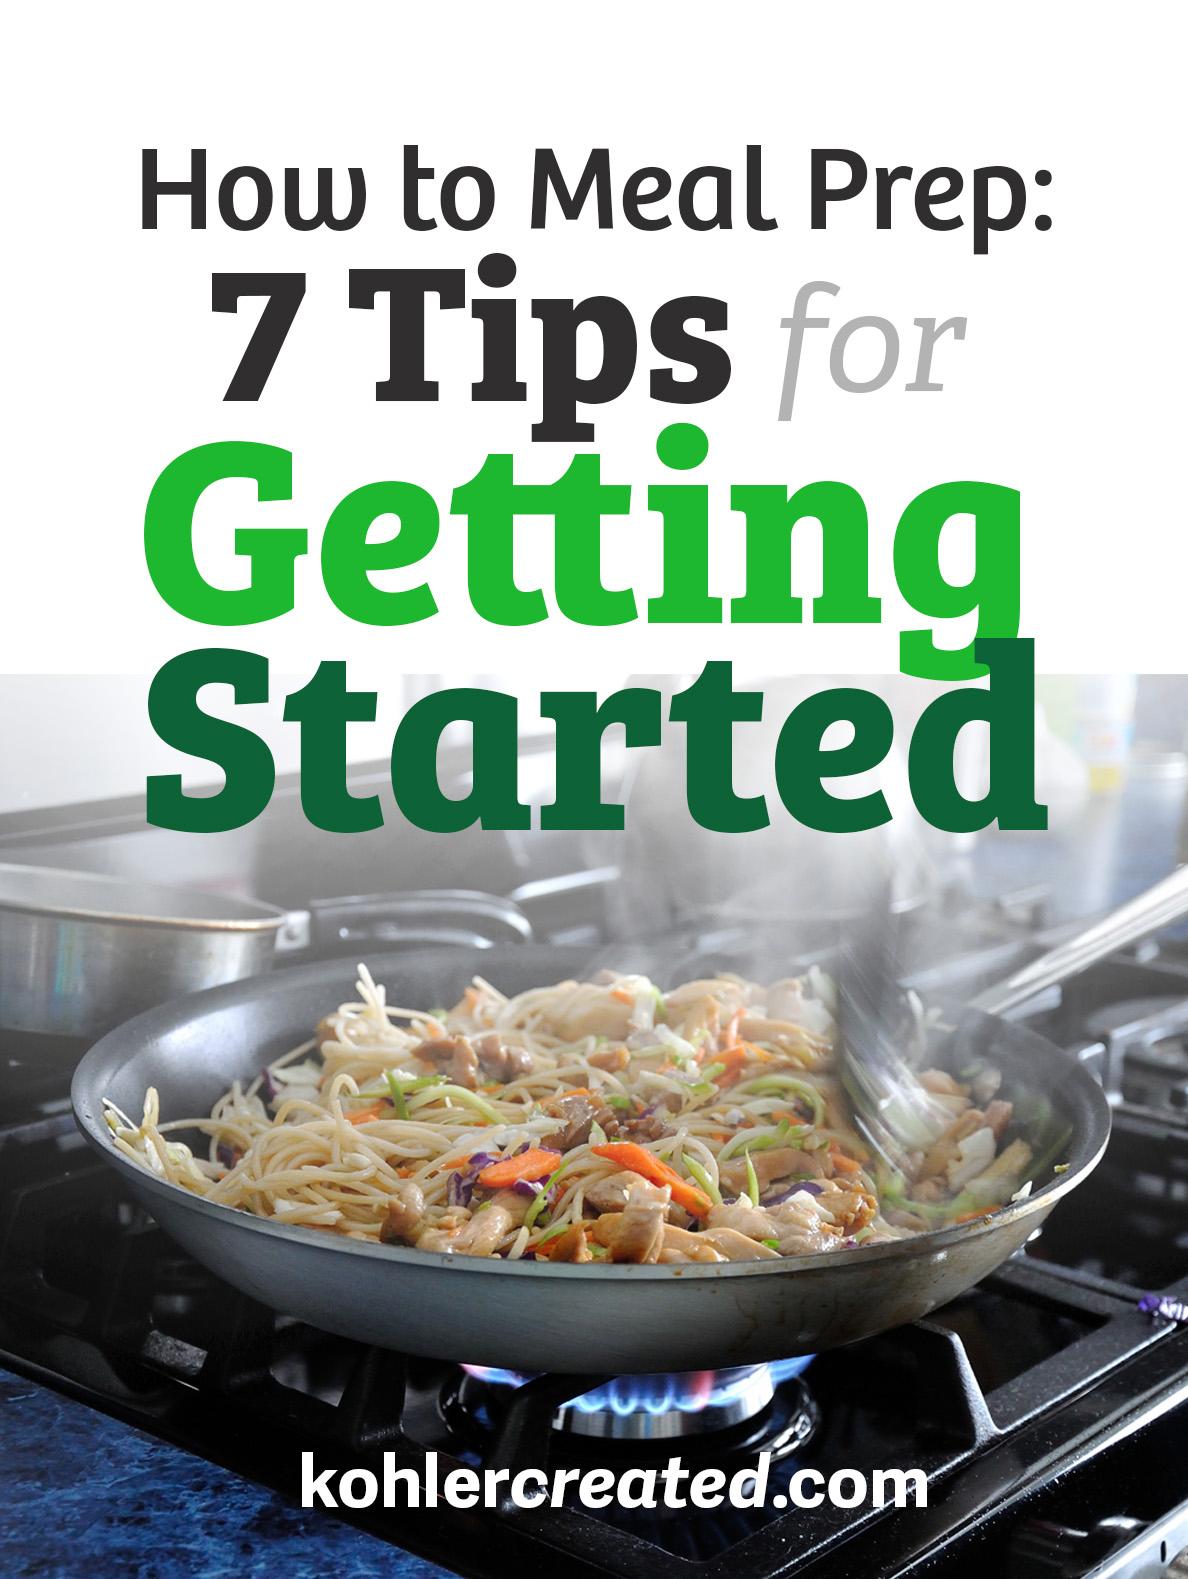 How to Meal Prep: 7 Tips for Beginners - Kohler Created